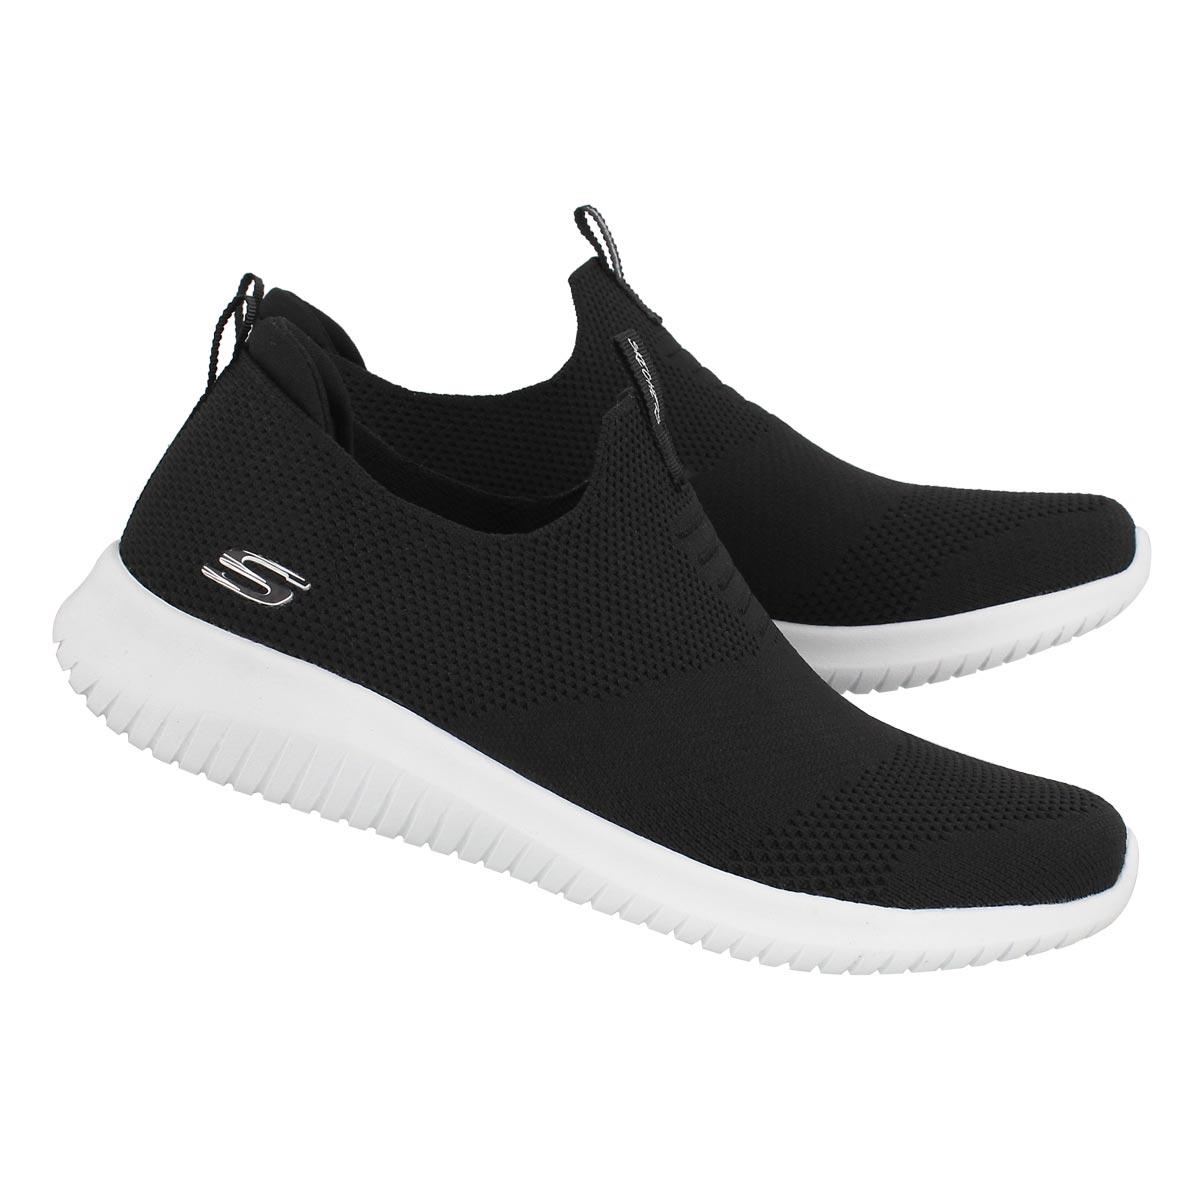 Lds Ultra Flex blk/wht slip on sneaker